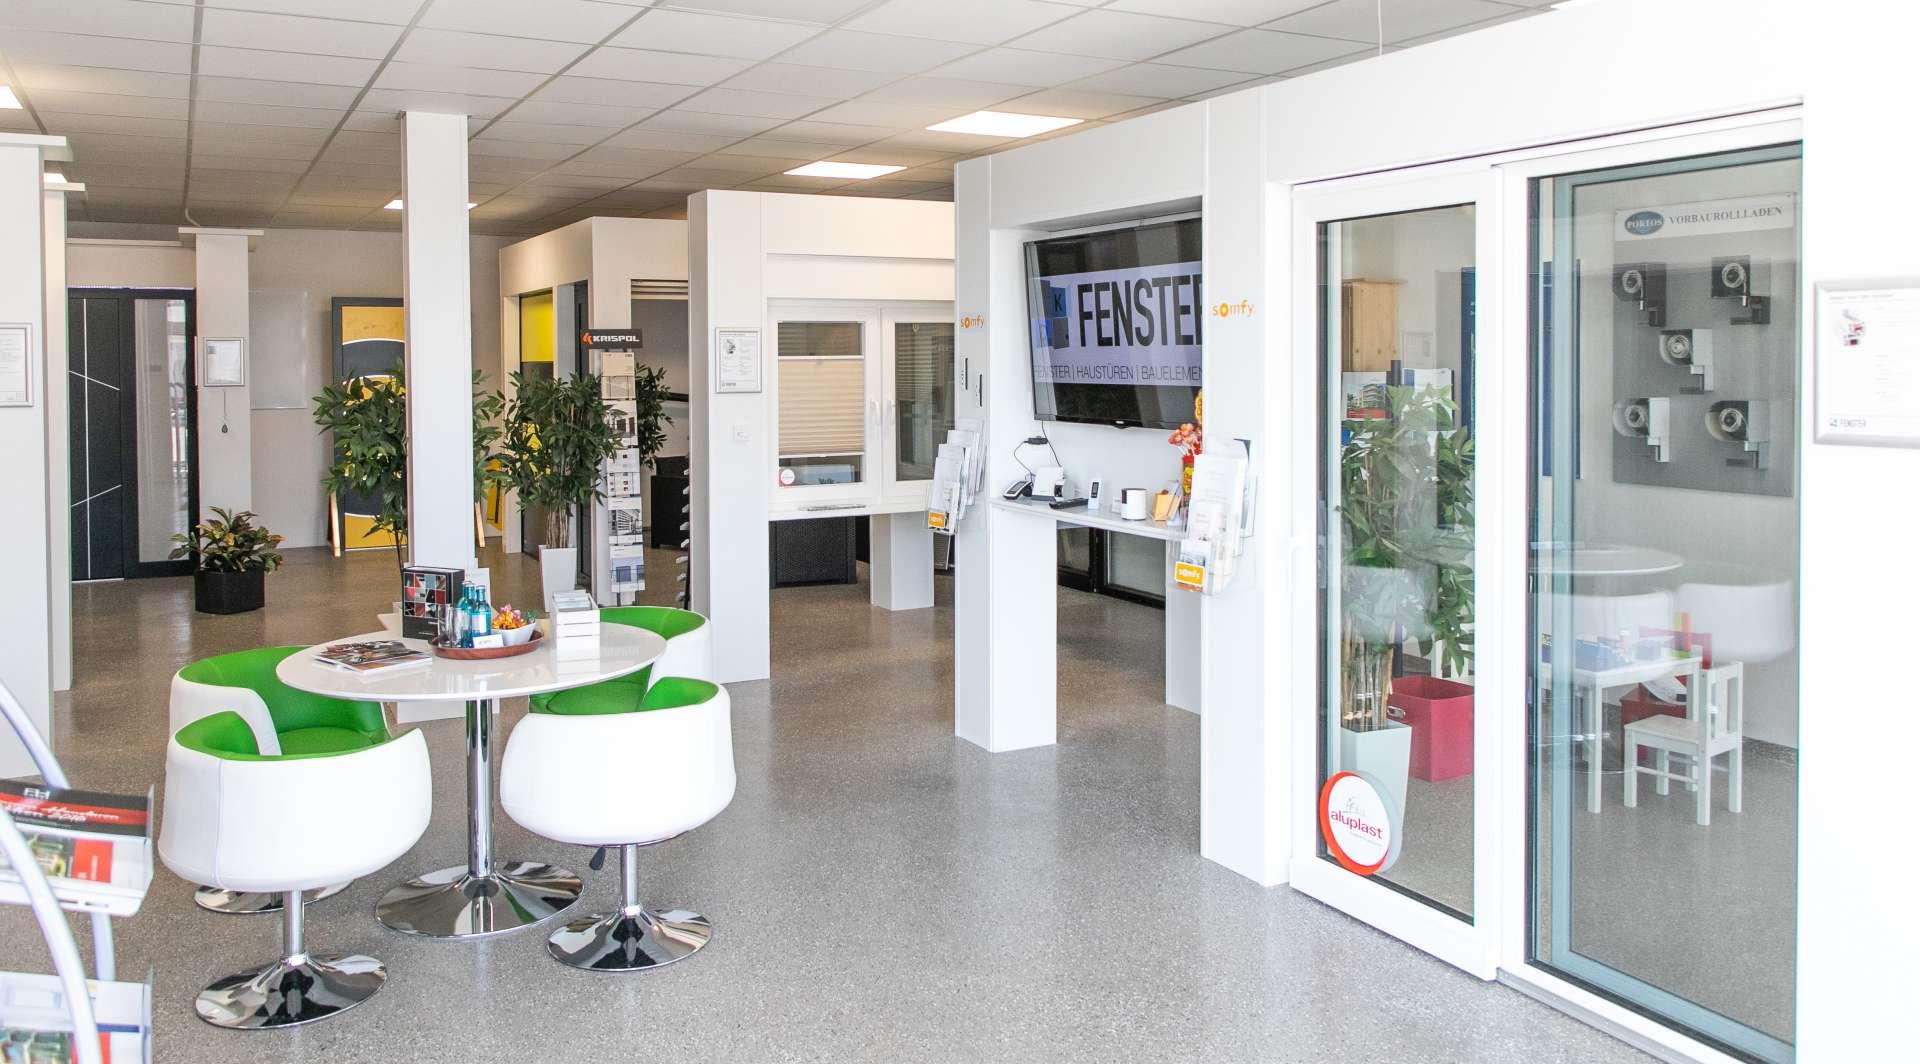 DK Fenster Geschäftsstelle Service